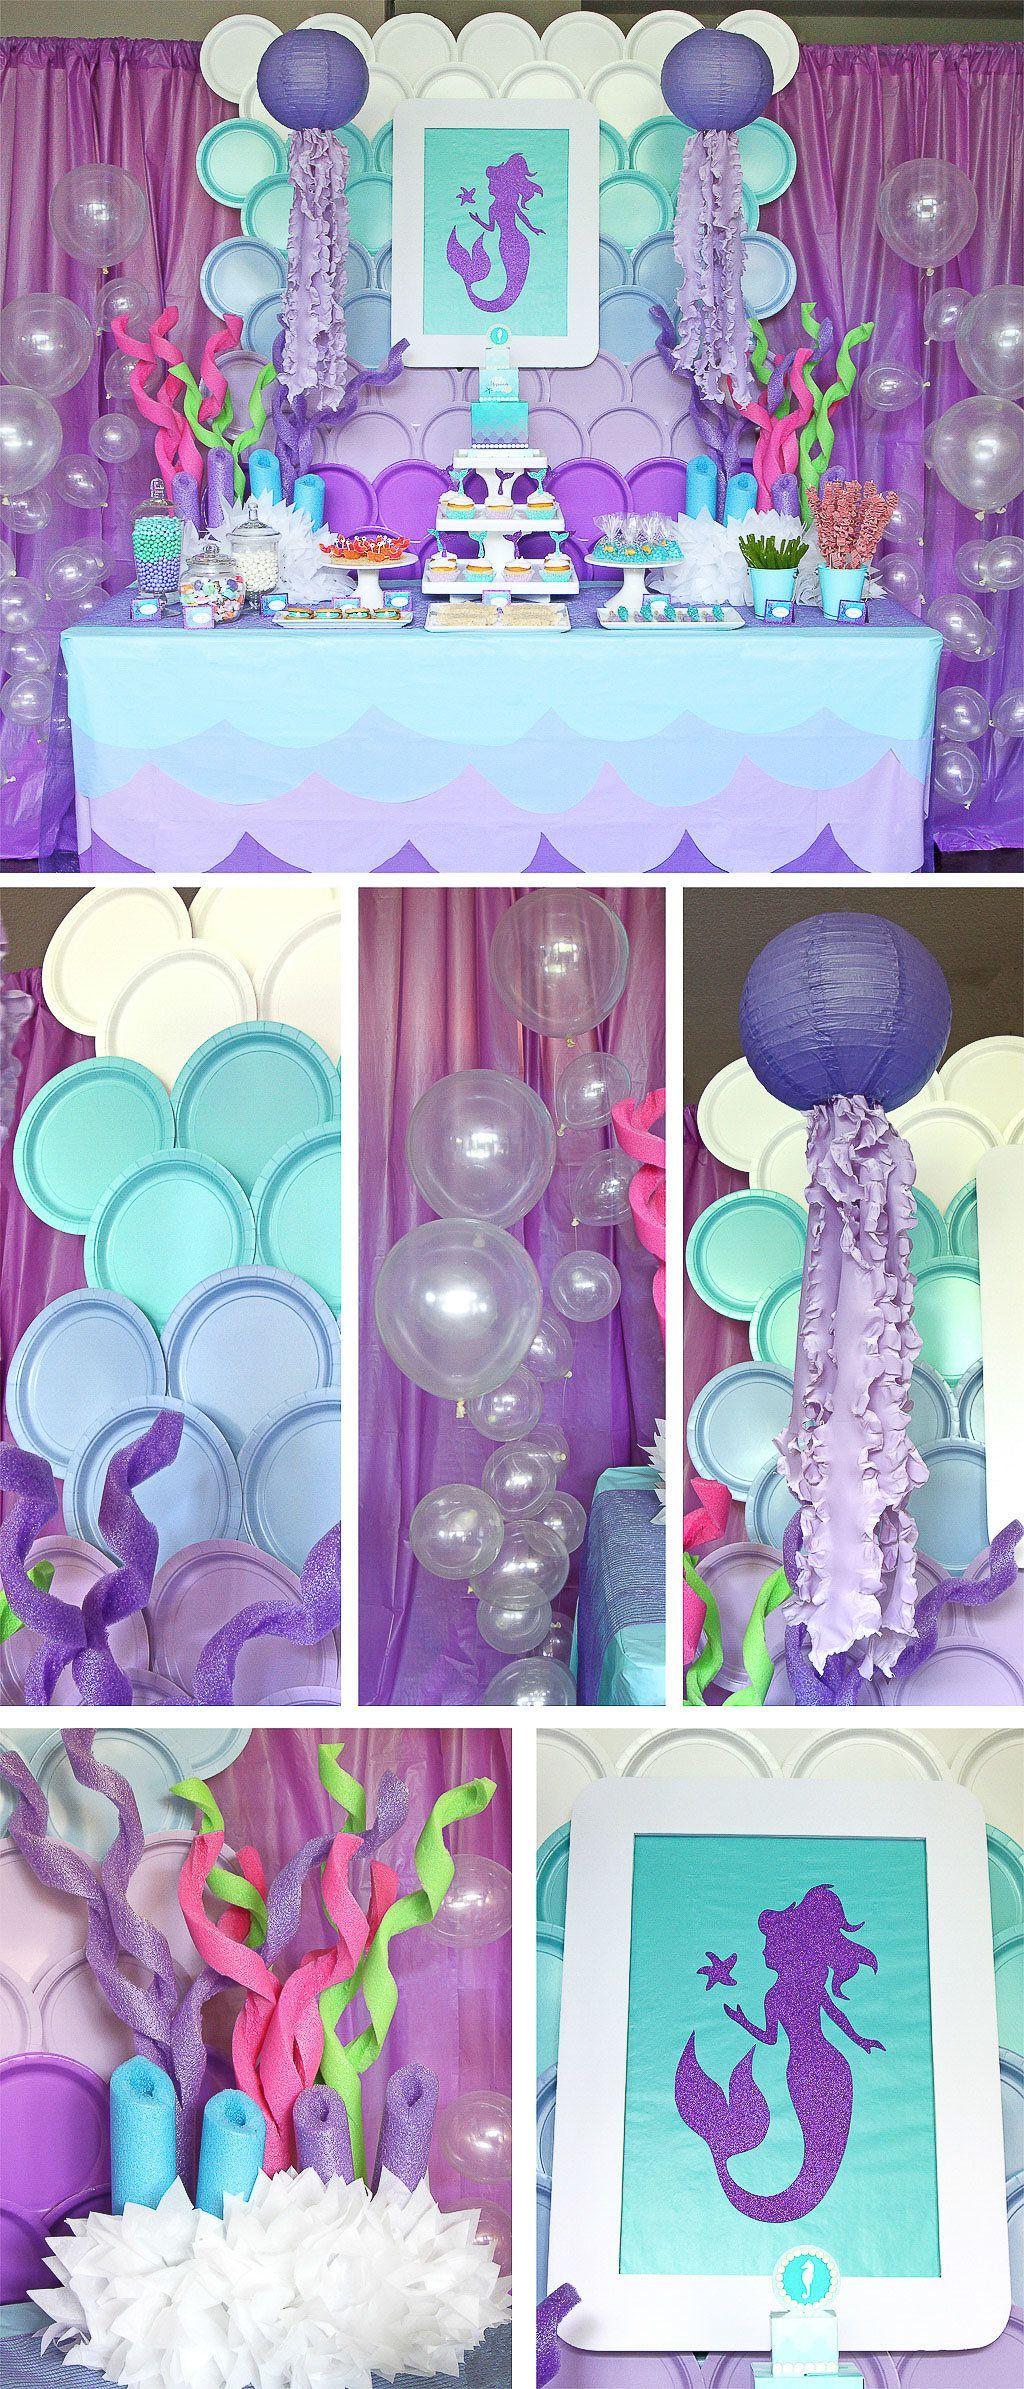 Mermaid Birthday Party Decoration Ideas  Mermaid Party Ideas